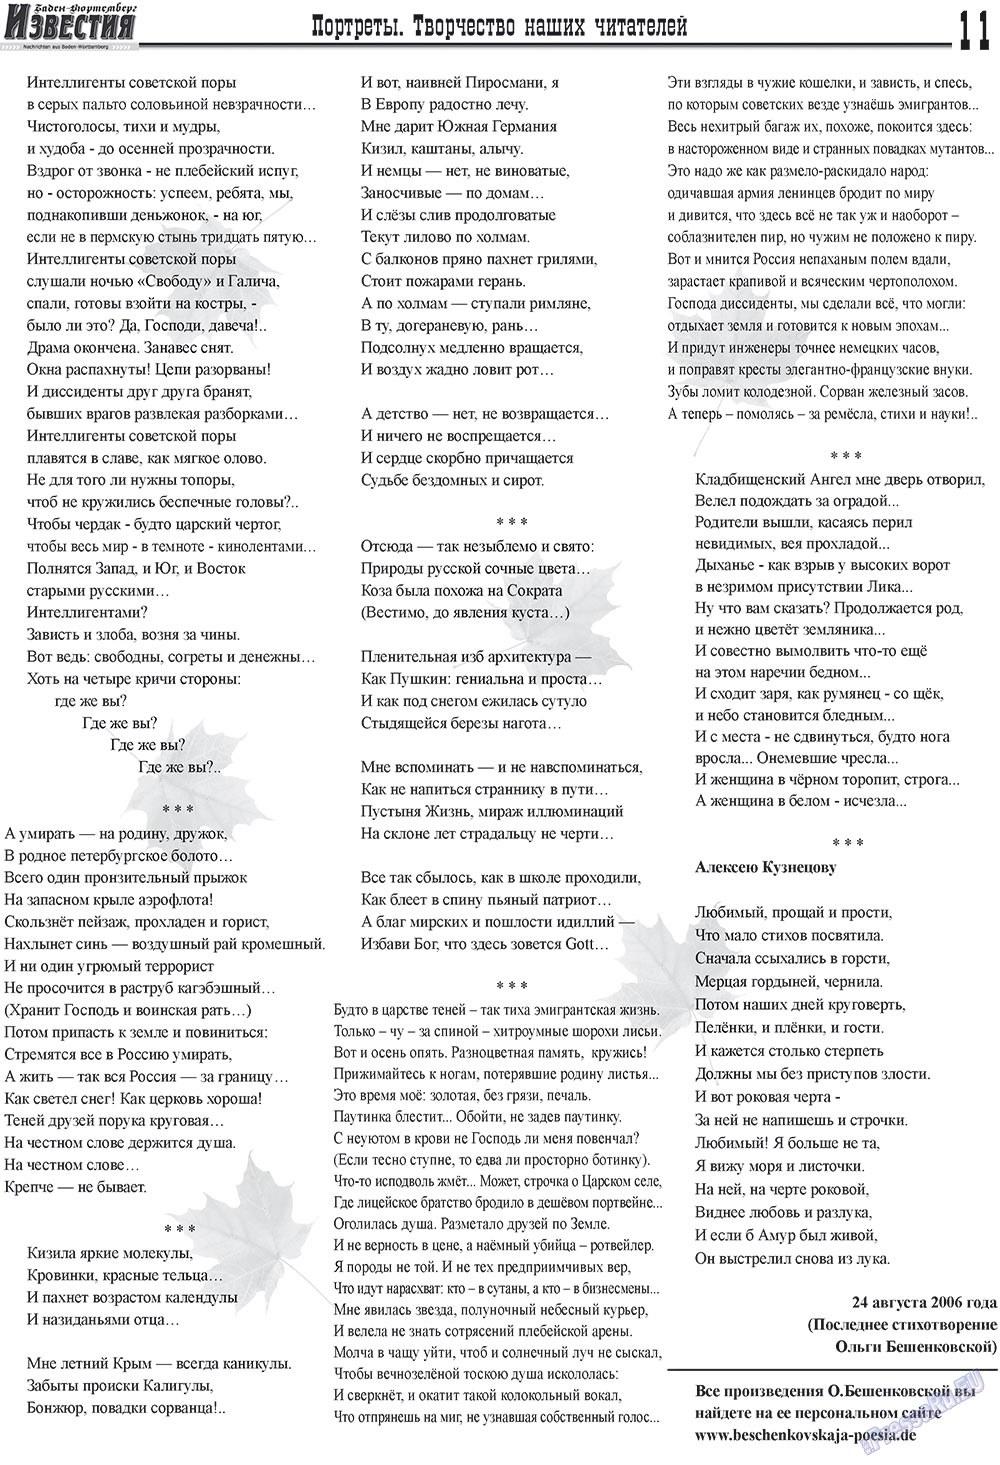 Известия BW (газета). 2009 год, номер 8, стр. 11